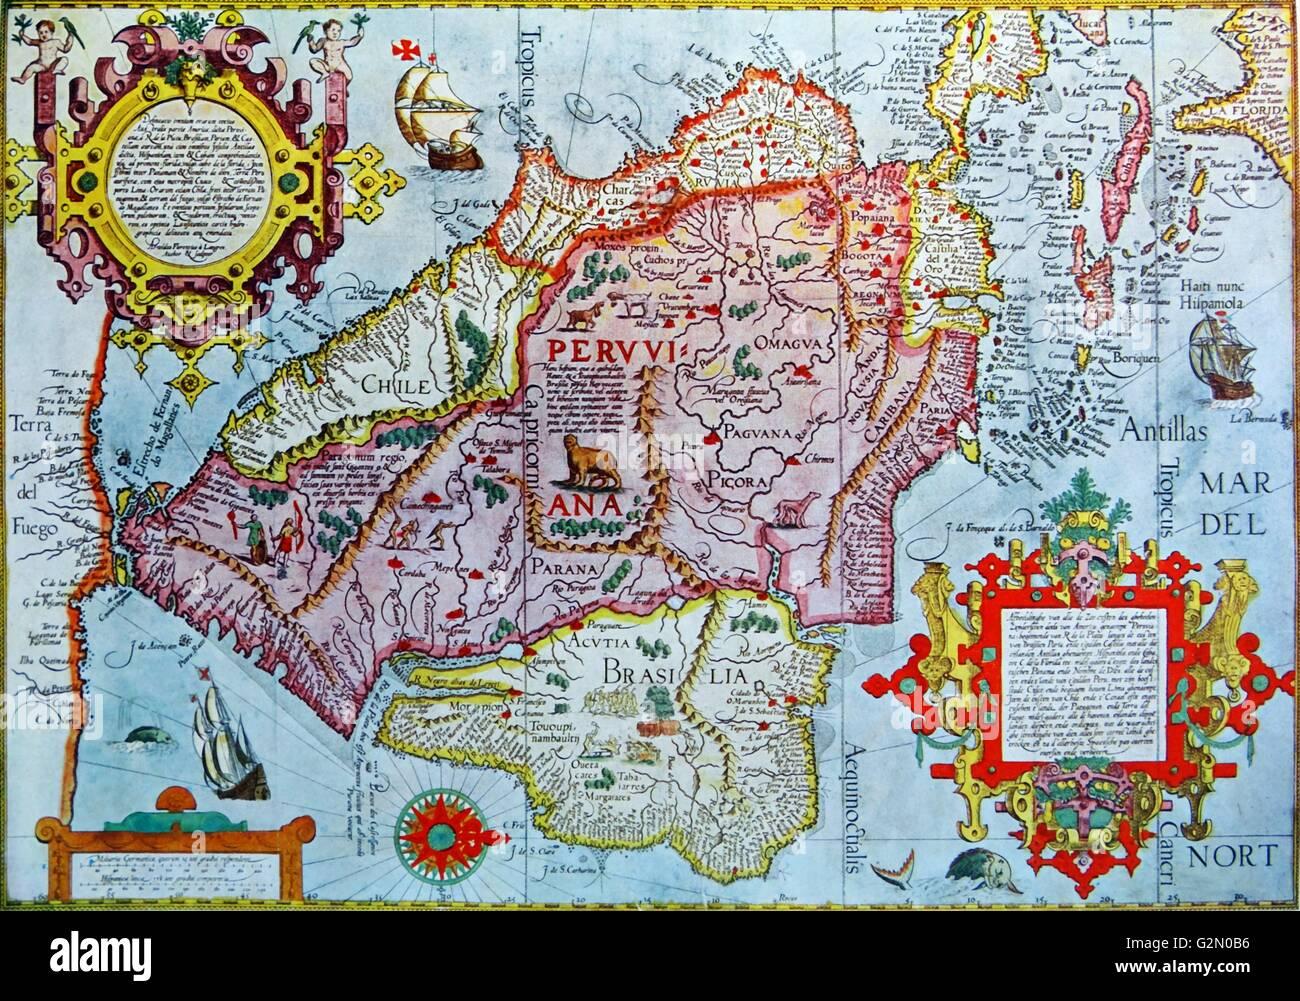 Map peru stock photos map peru stock images alamy map of peru arnoldus florentius 1599 stock image gumiabroncs Gallery